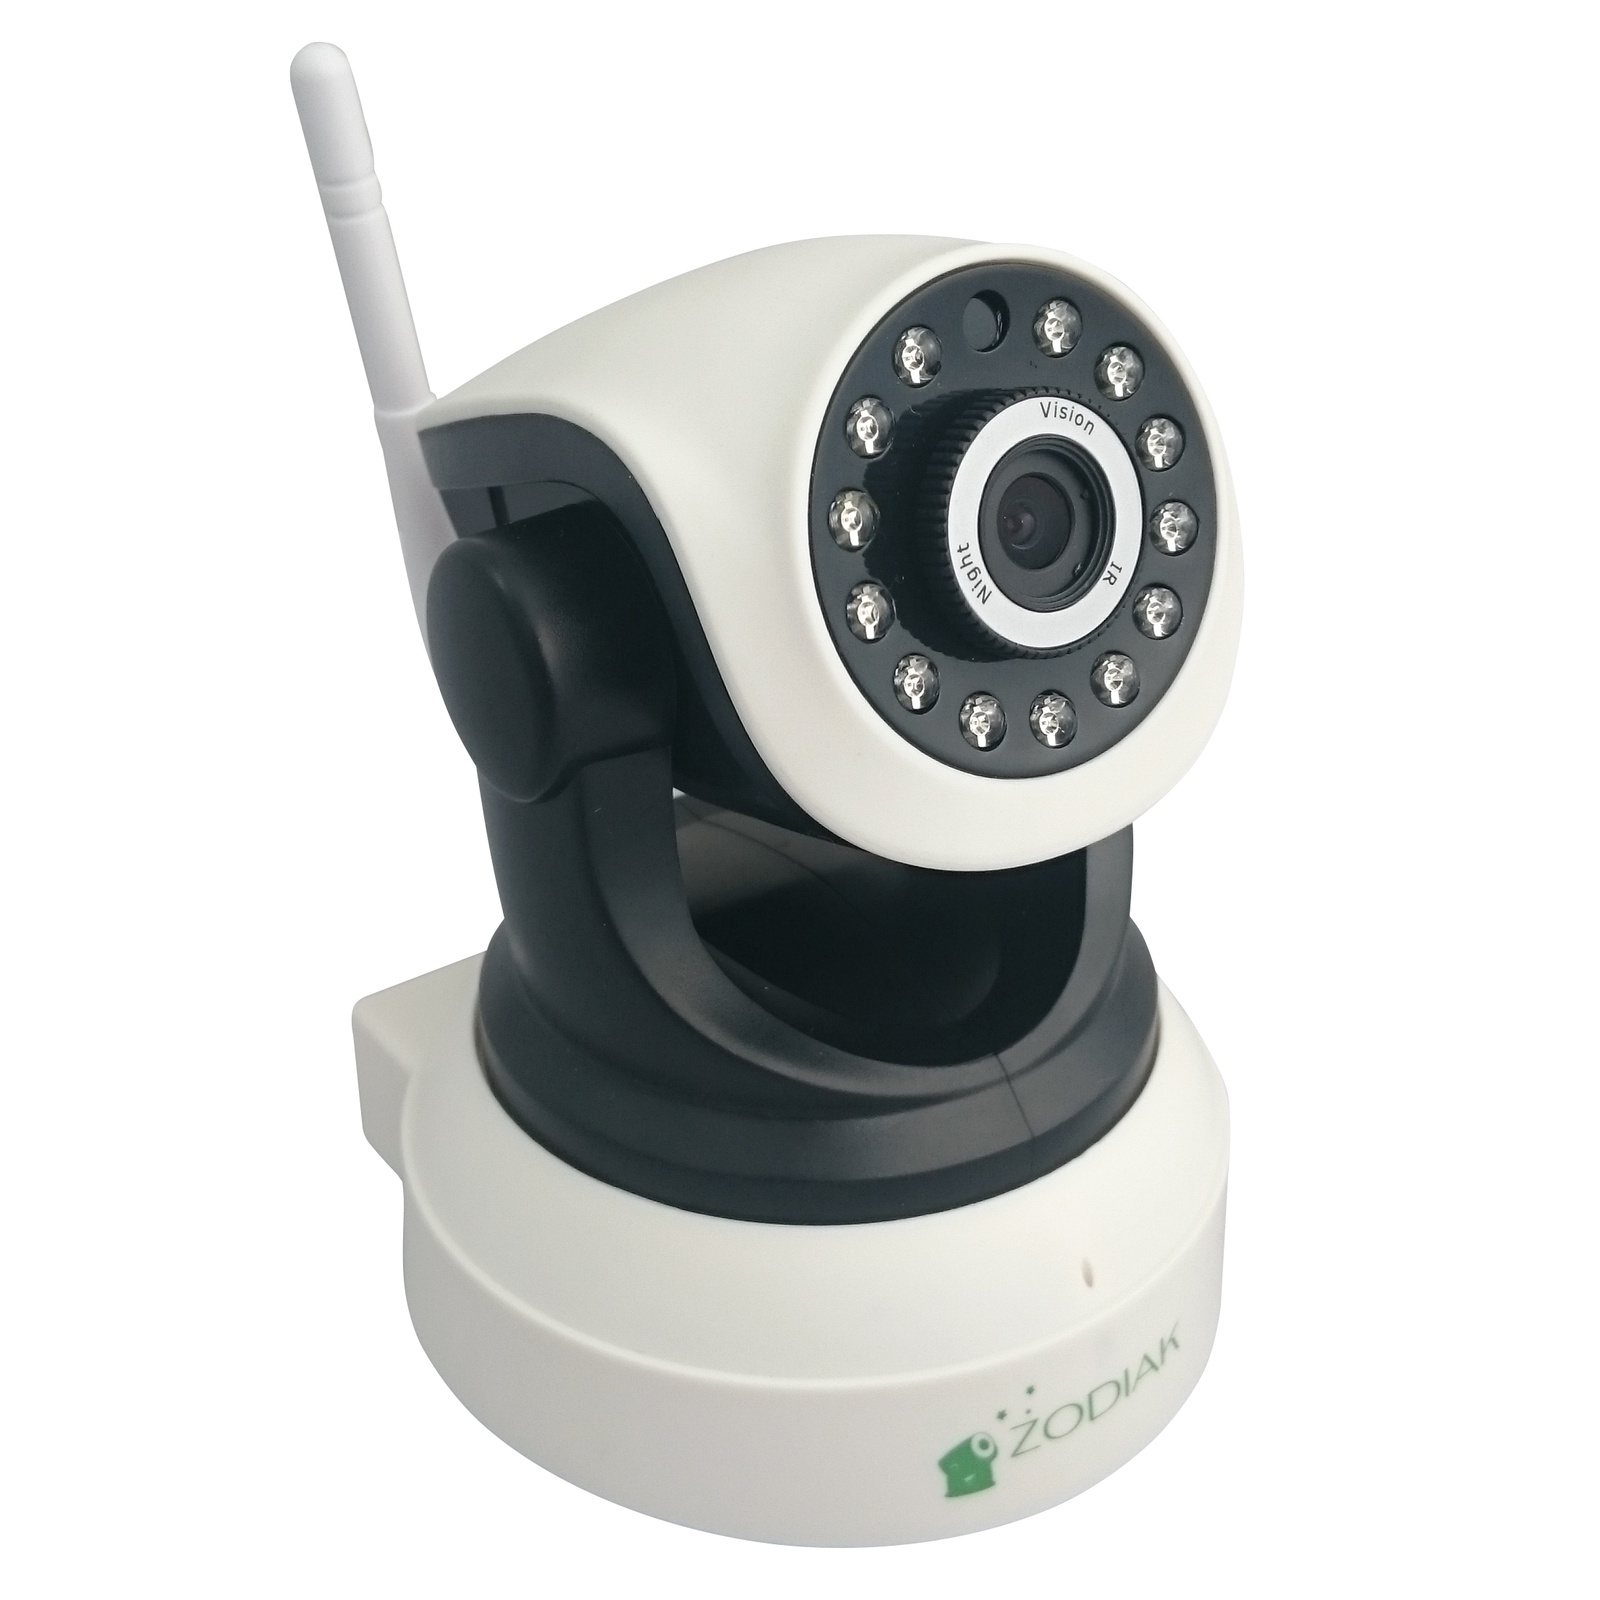 Камера видеонаблюдения Zodikam Zodikam 909W, 4 видеорегистратор zodikam dvr 10